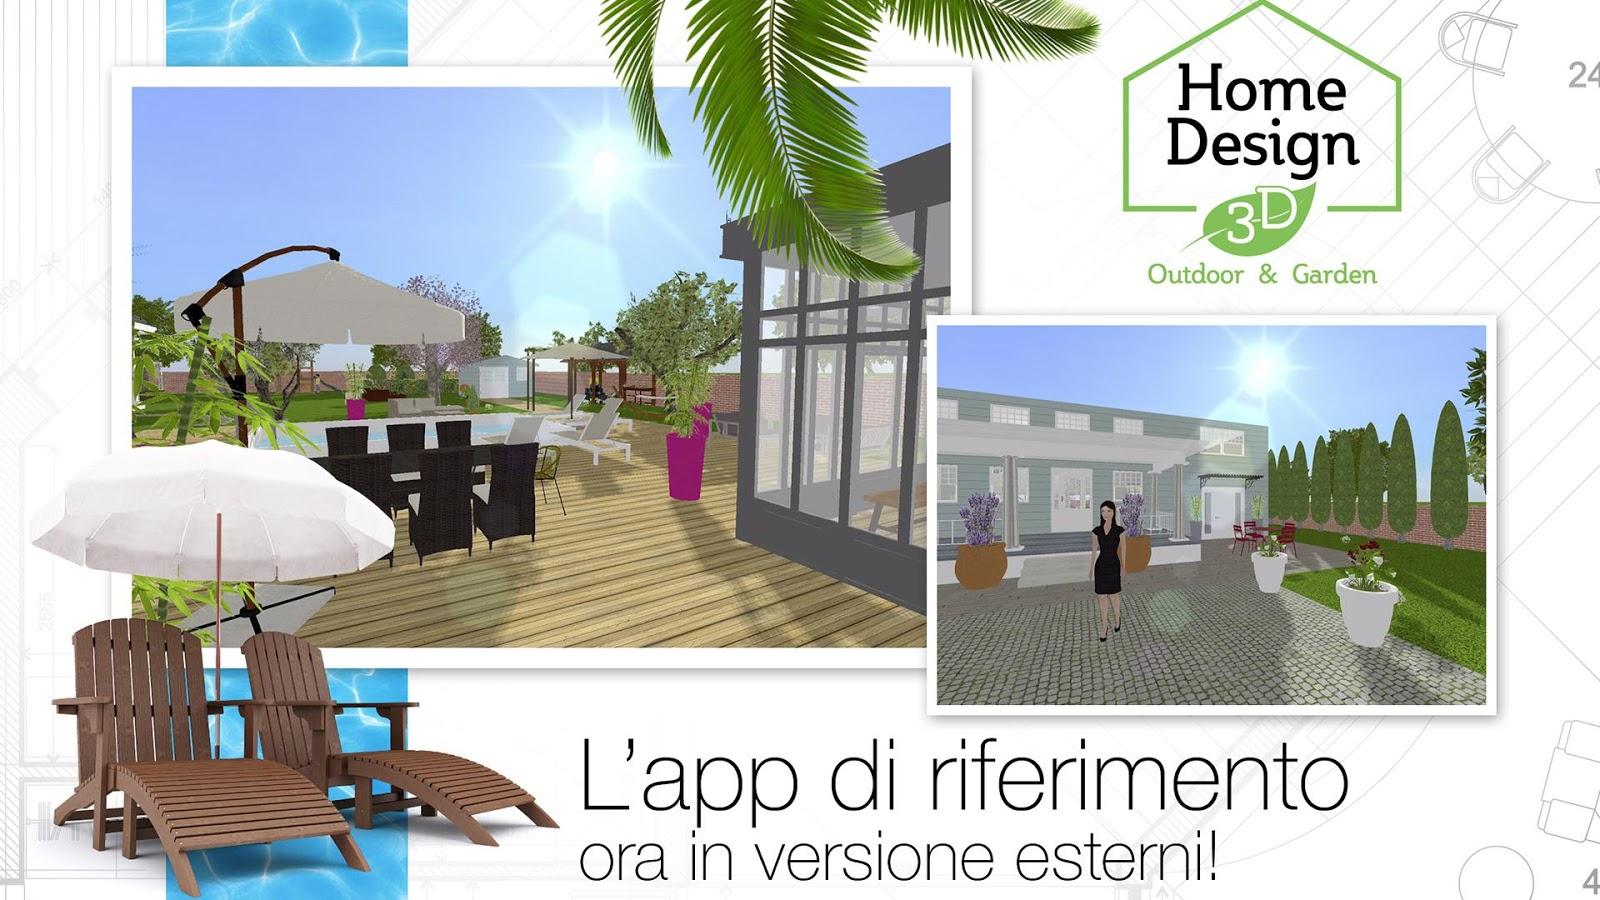 Home design 3d outdoor garden app android su google play - 3d home design app ...